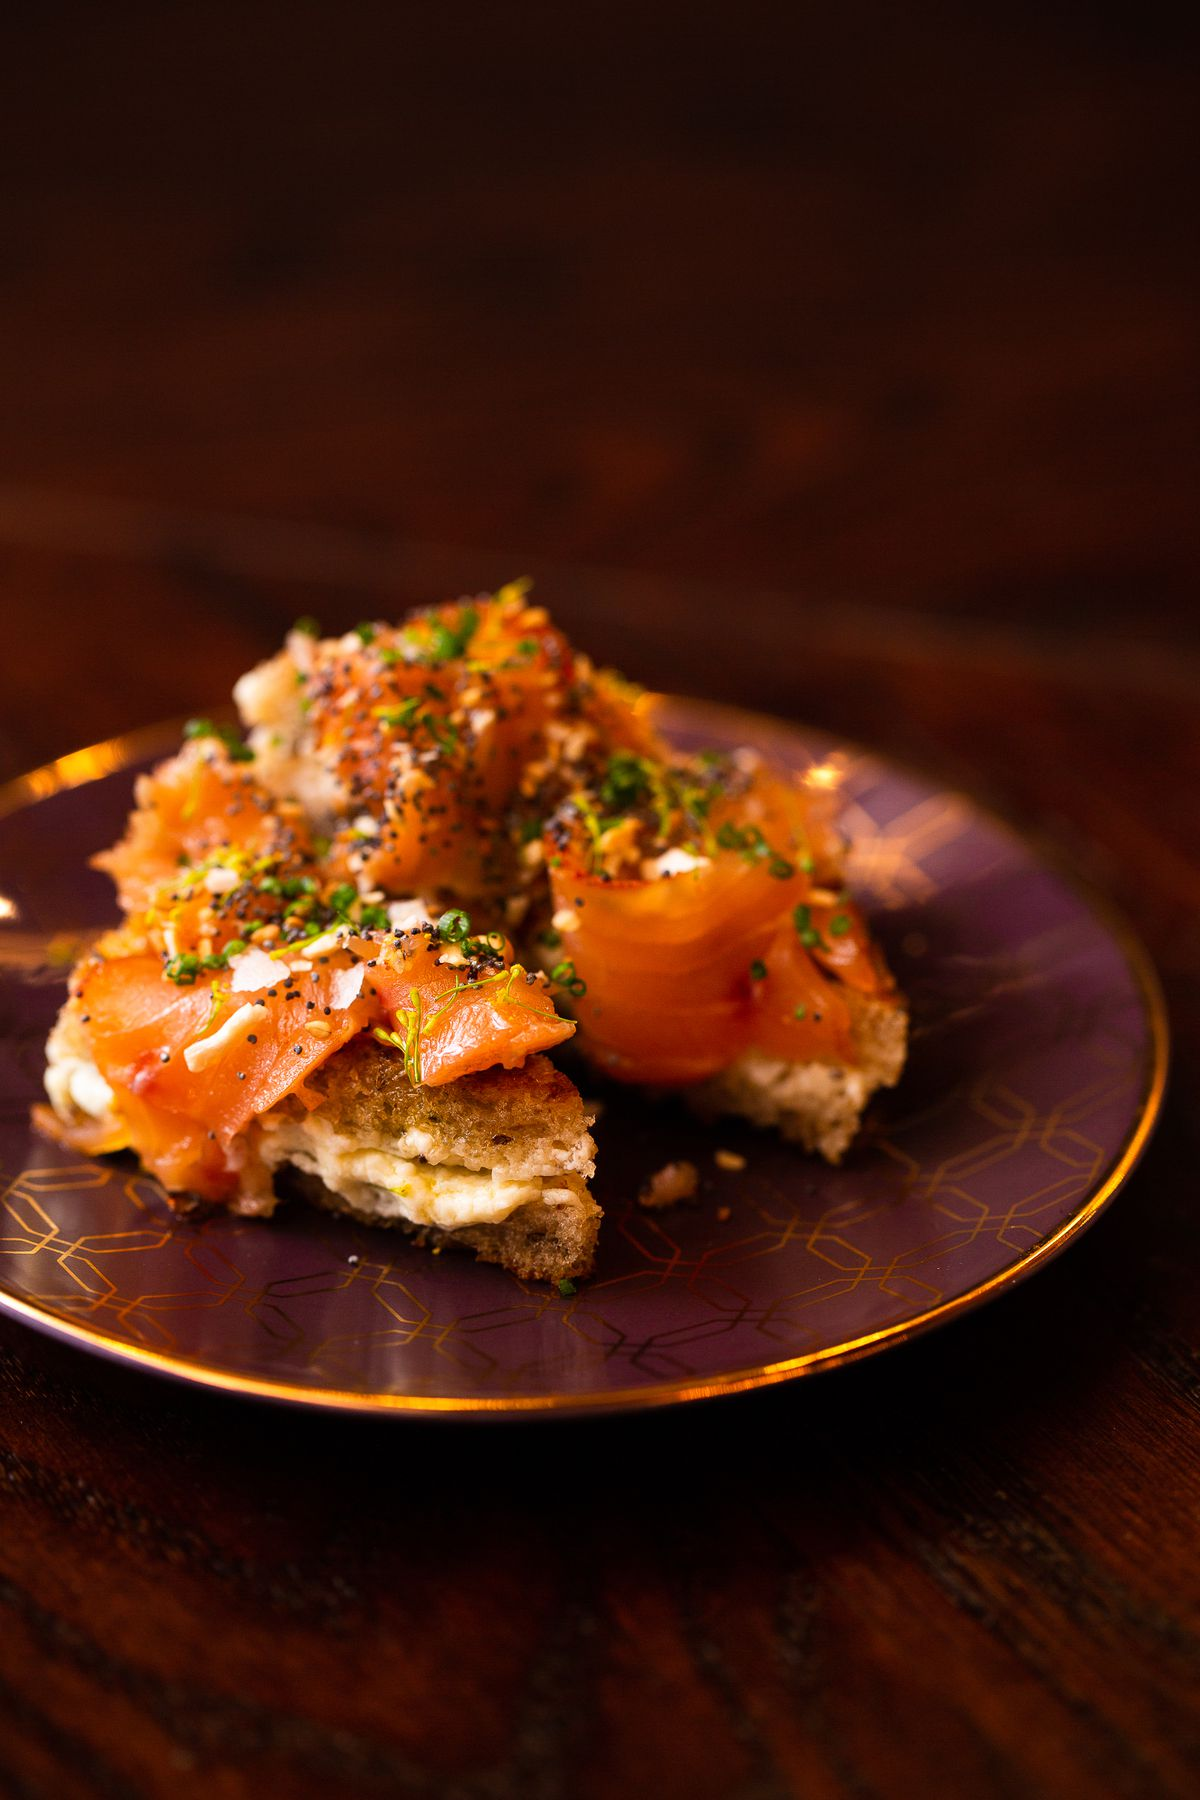 Seeded pastrami salmon and brillat savarin at Fool's Errand